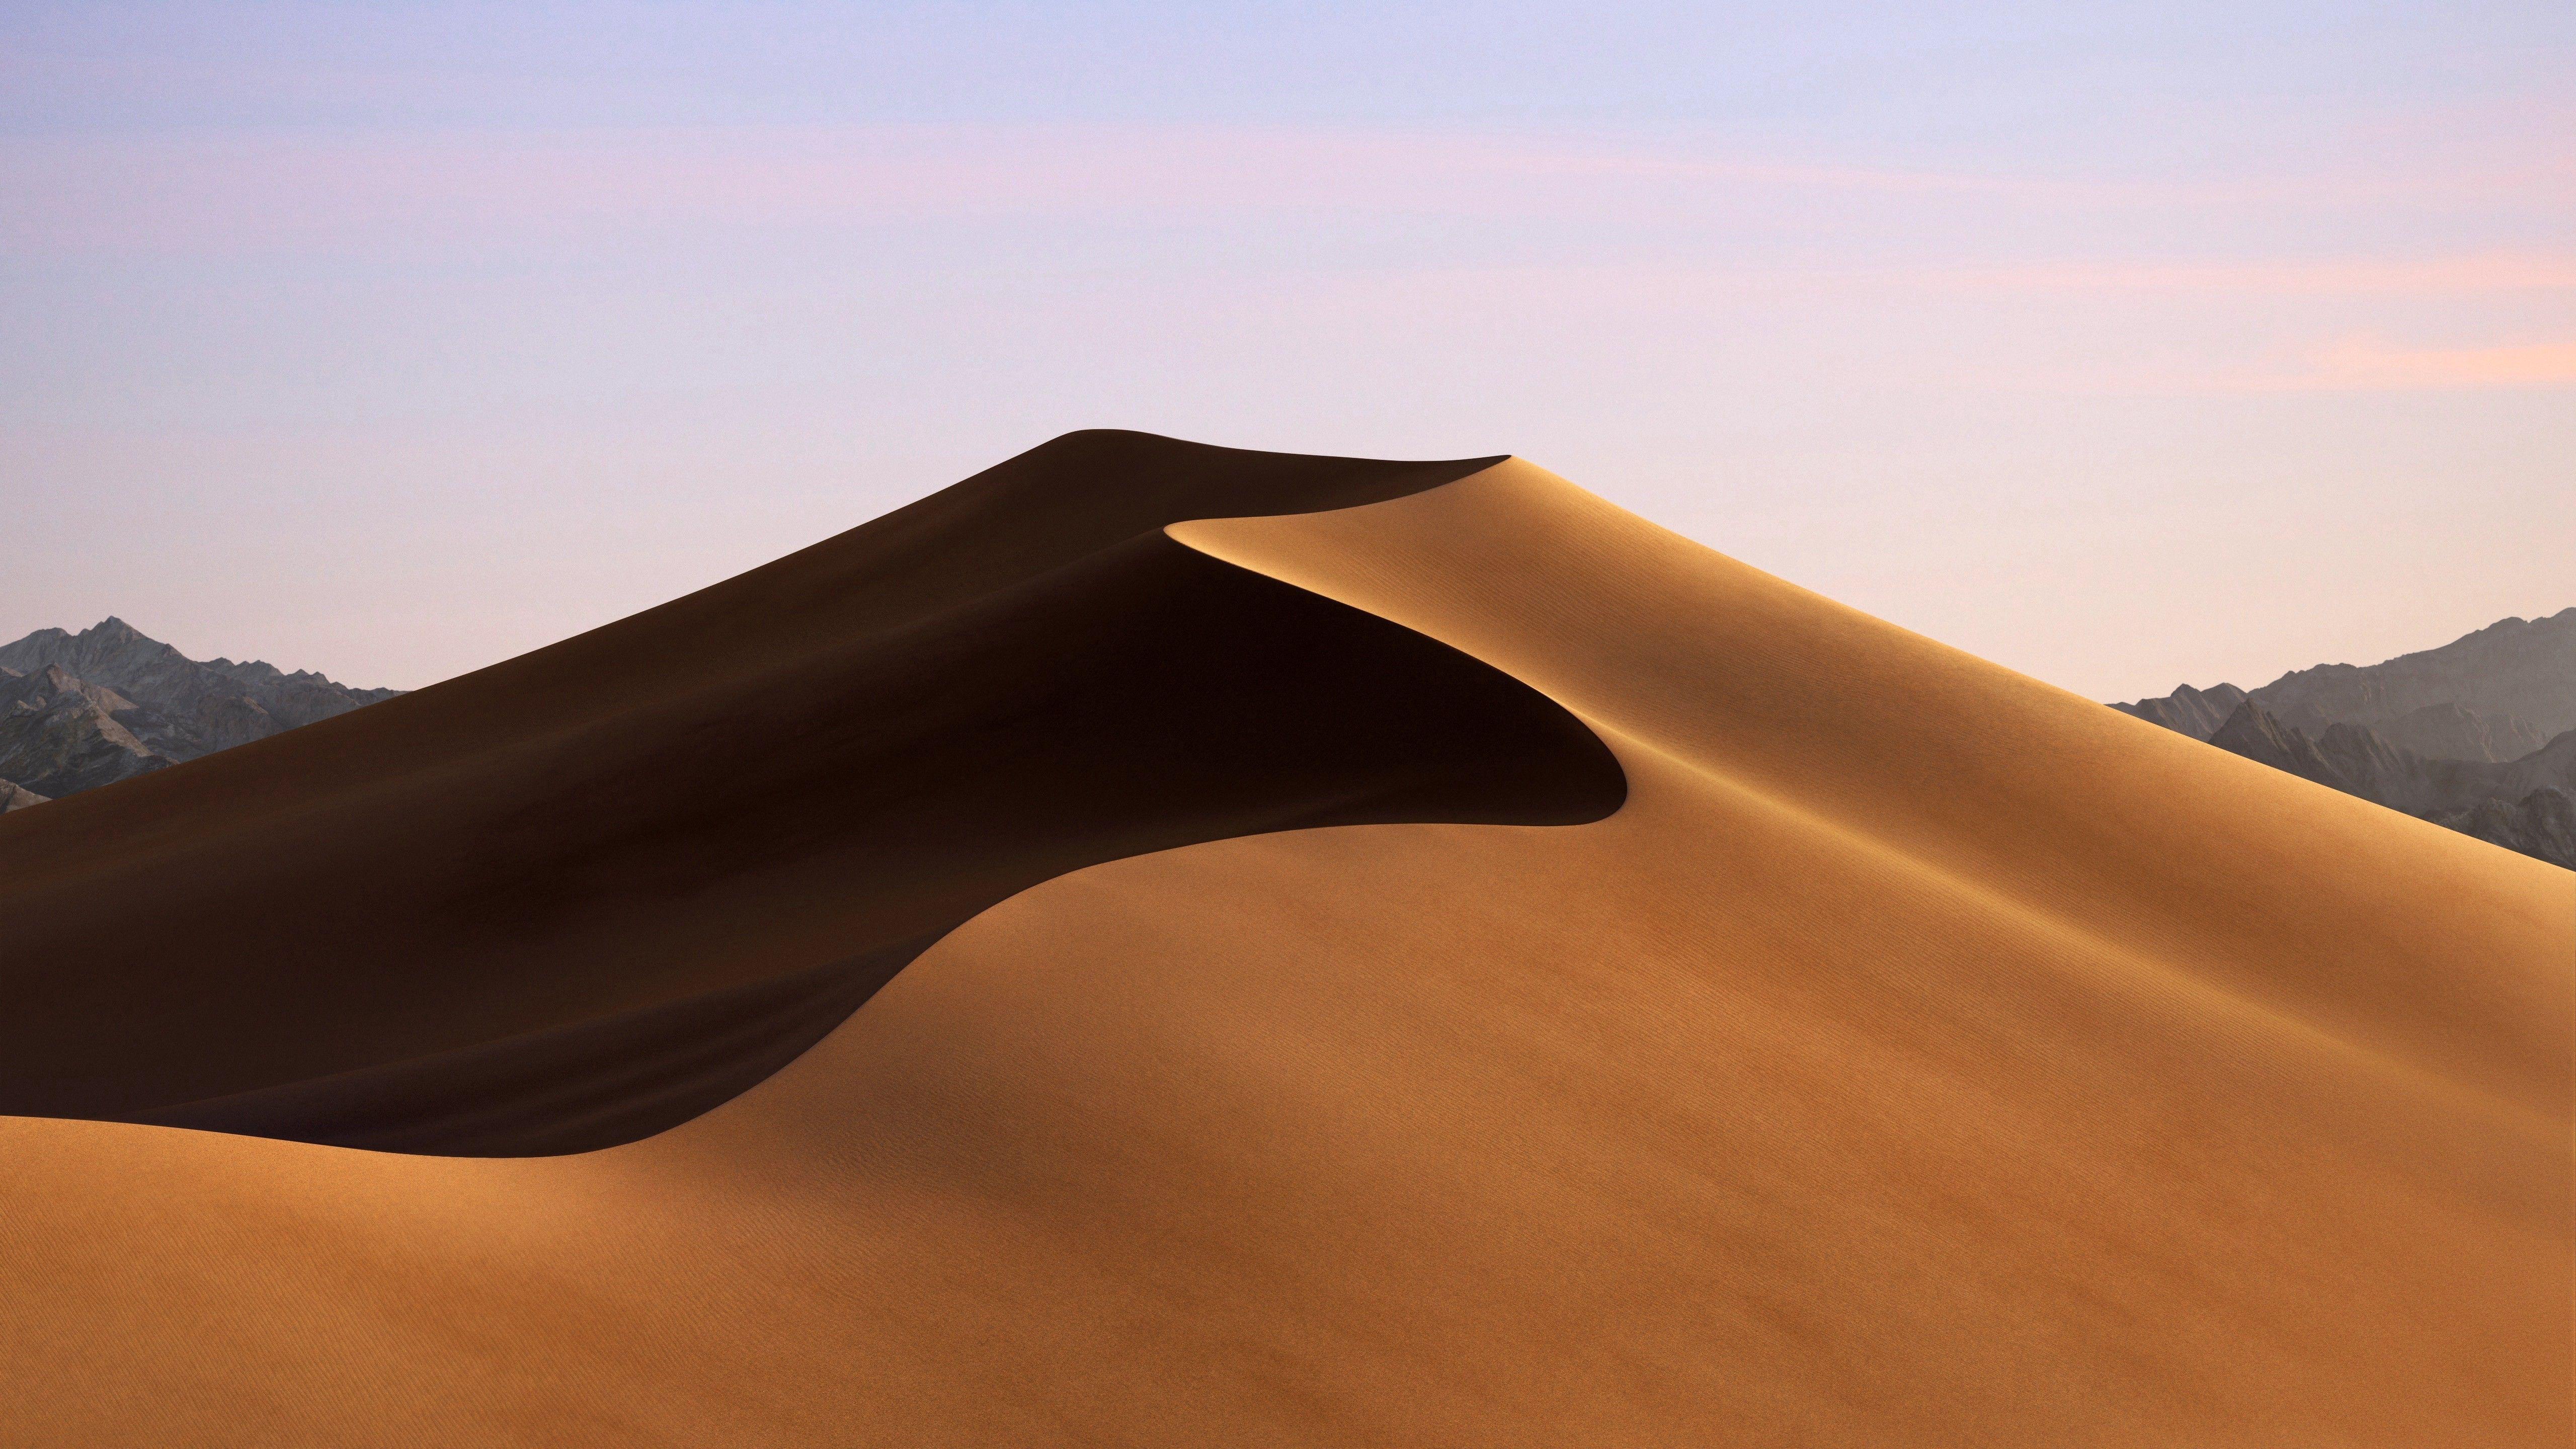 Mac OS Mojave dynamic wallpapers, HD Desktop Wallpaper